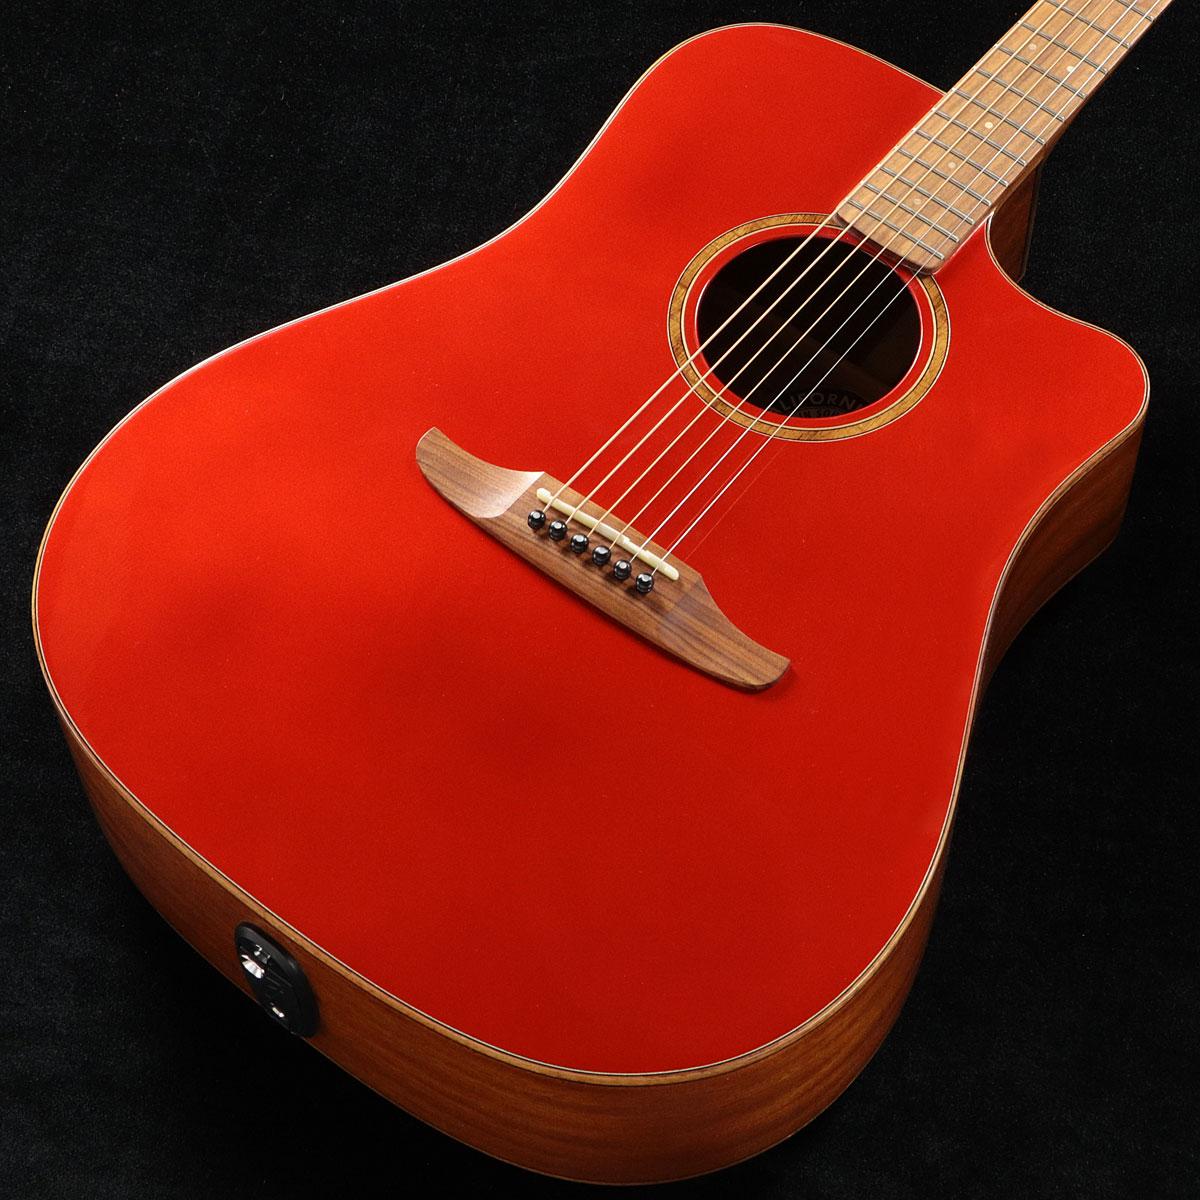 Fender / Redondo Classic Hot Rod Red Metallic (HRM) 【CALIFORNIA SERIES】フェンダー アコースティックギター【渋谷店】